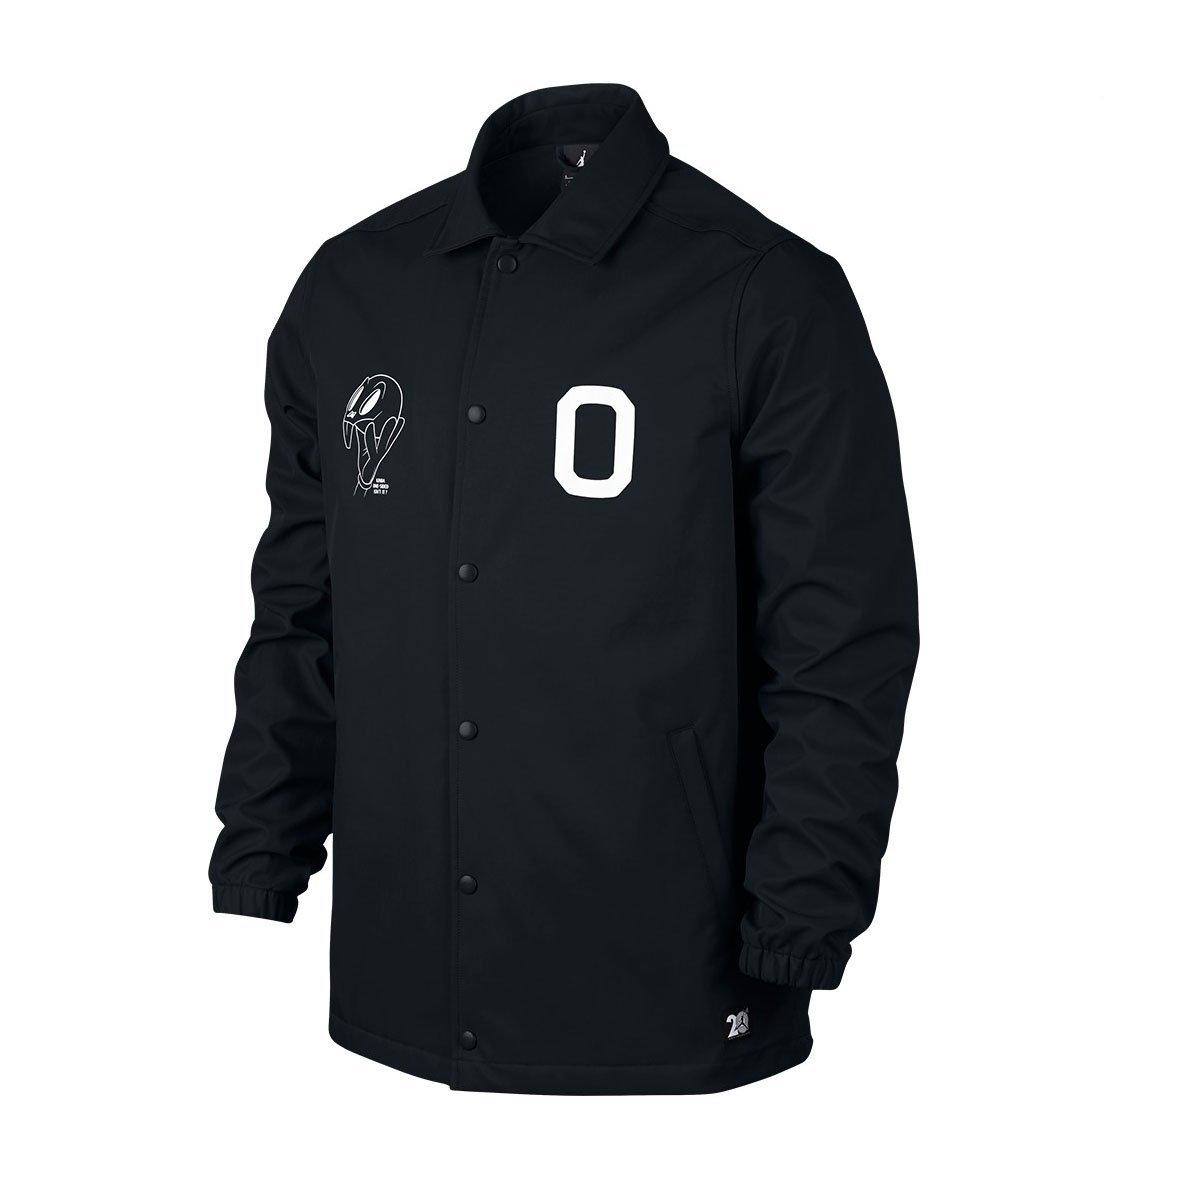 Nike Mens Air Jordan 11 Jacket Black/White Large